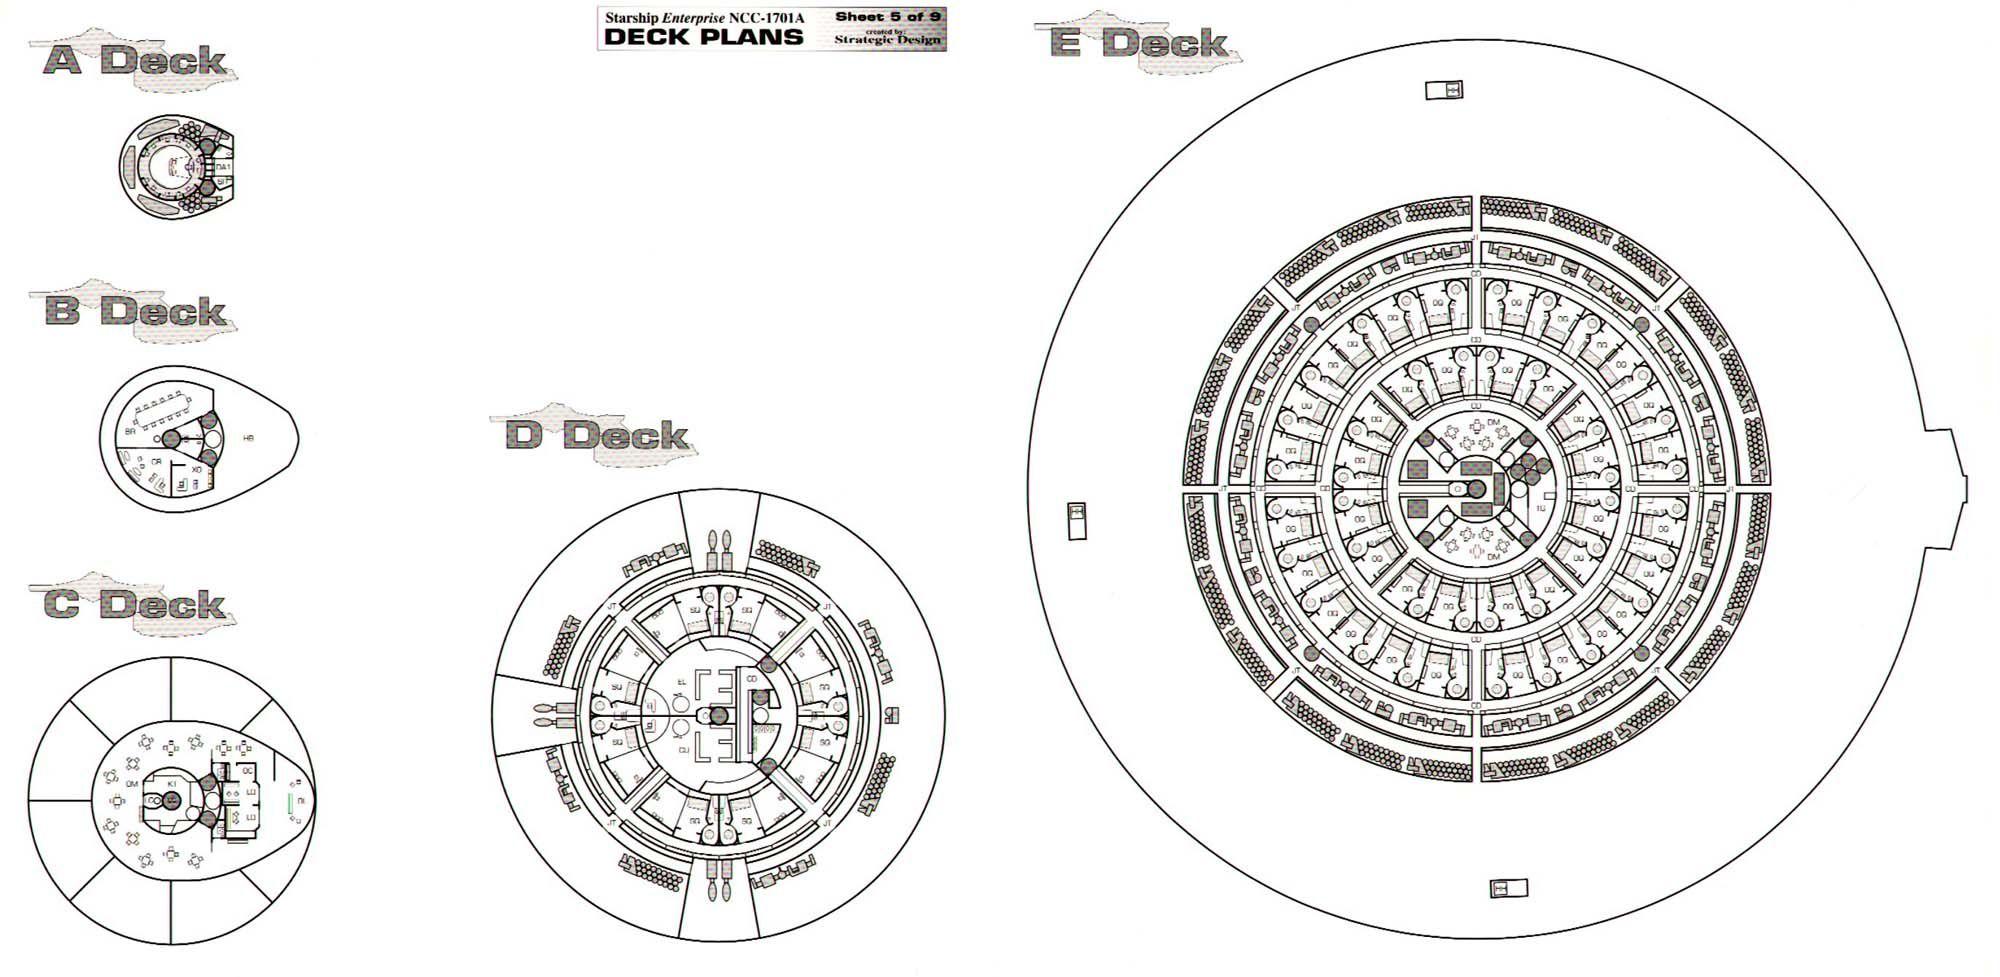 Star Trek Blueprints Uss Enterprise Ncc A Deck Plans